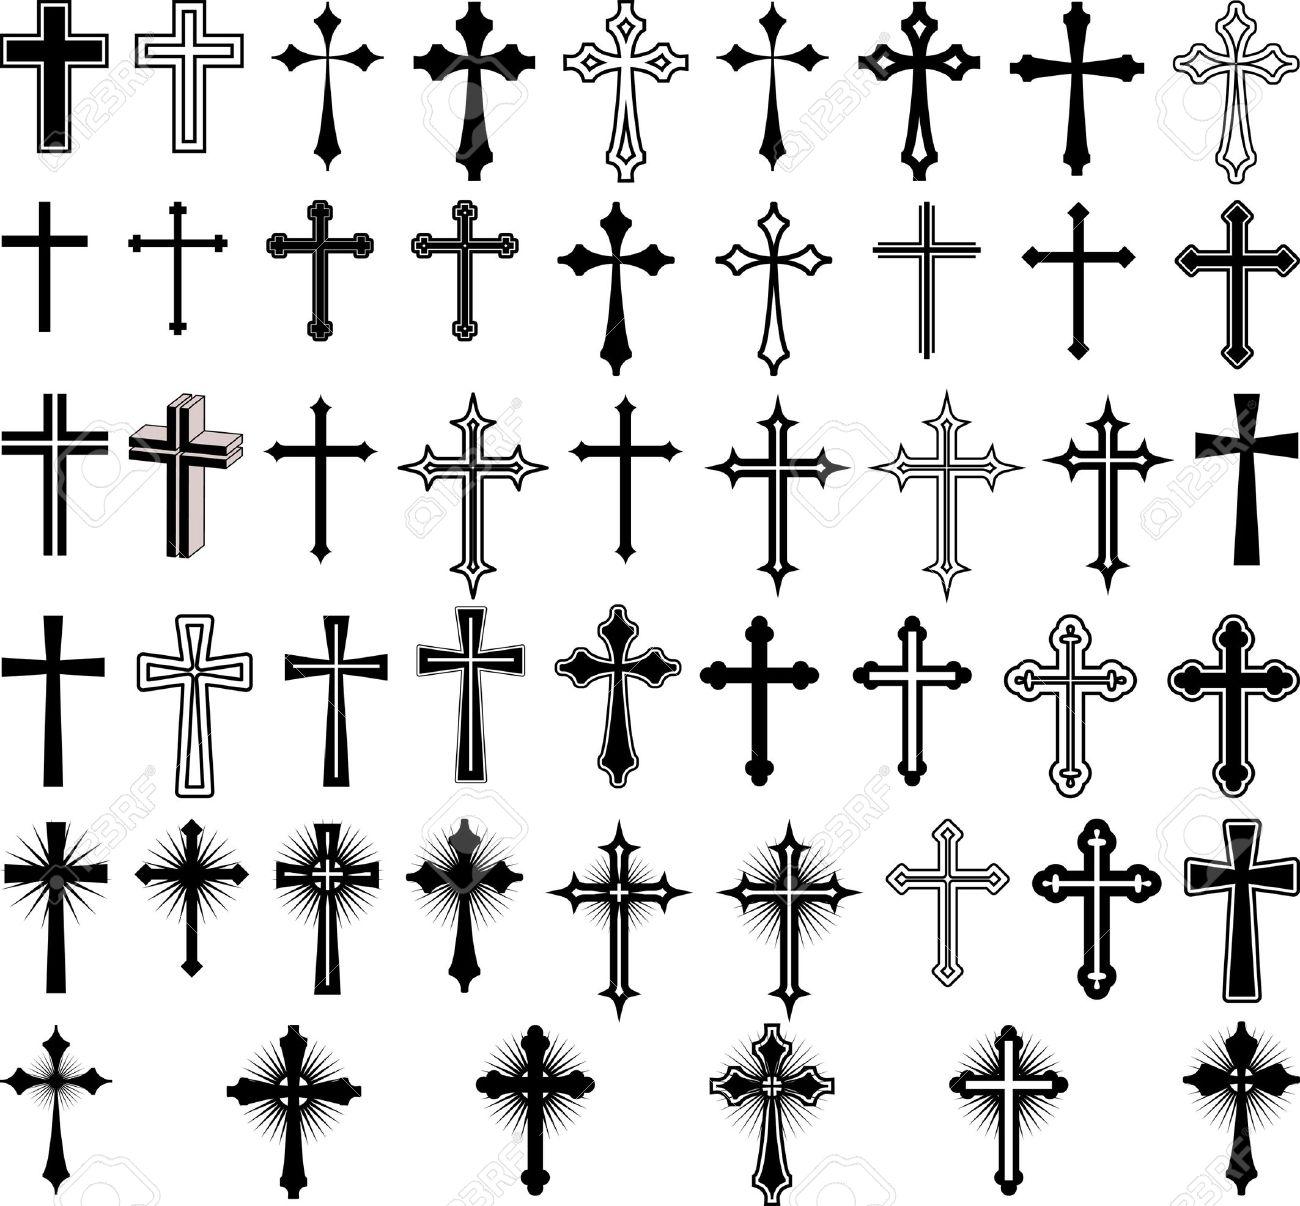 clip art illustration of crosses Stock Vector - 13691066